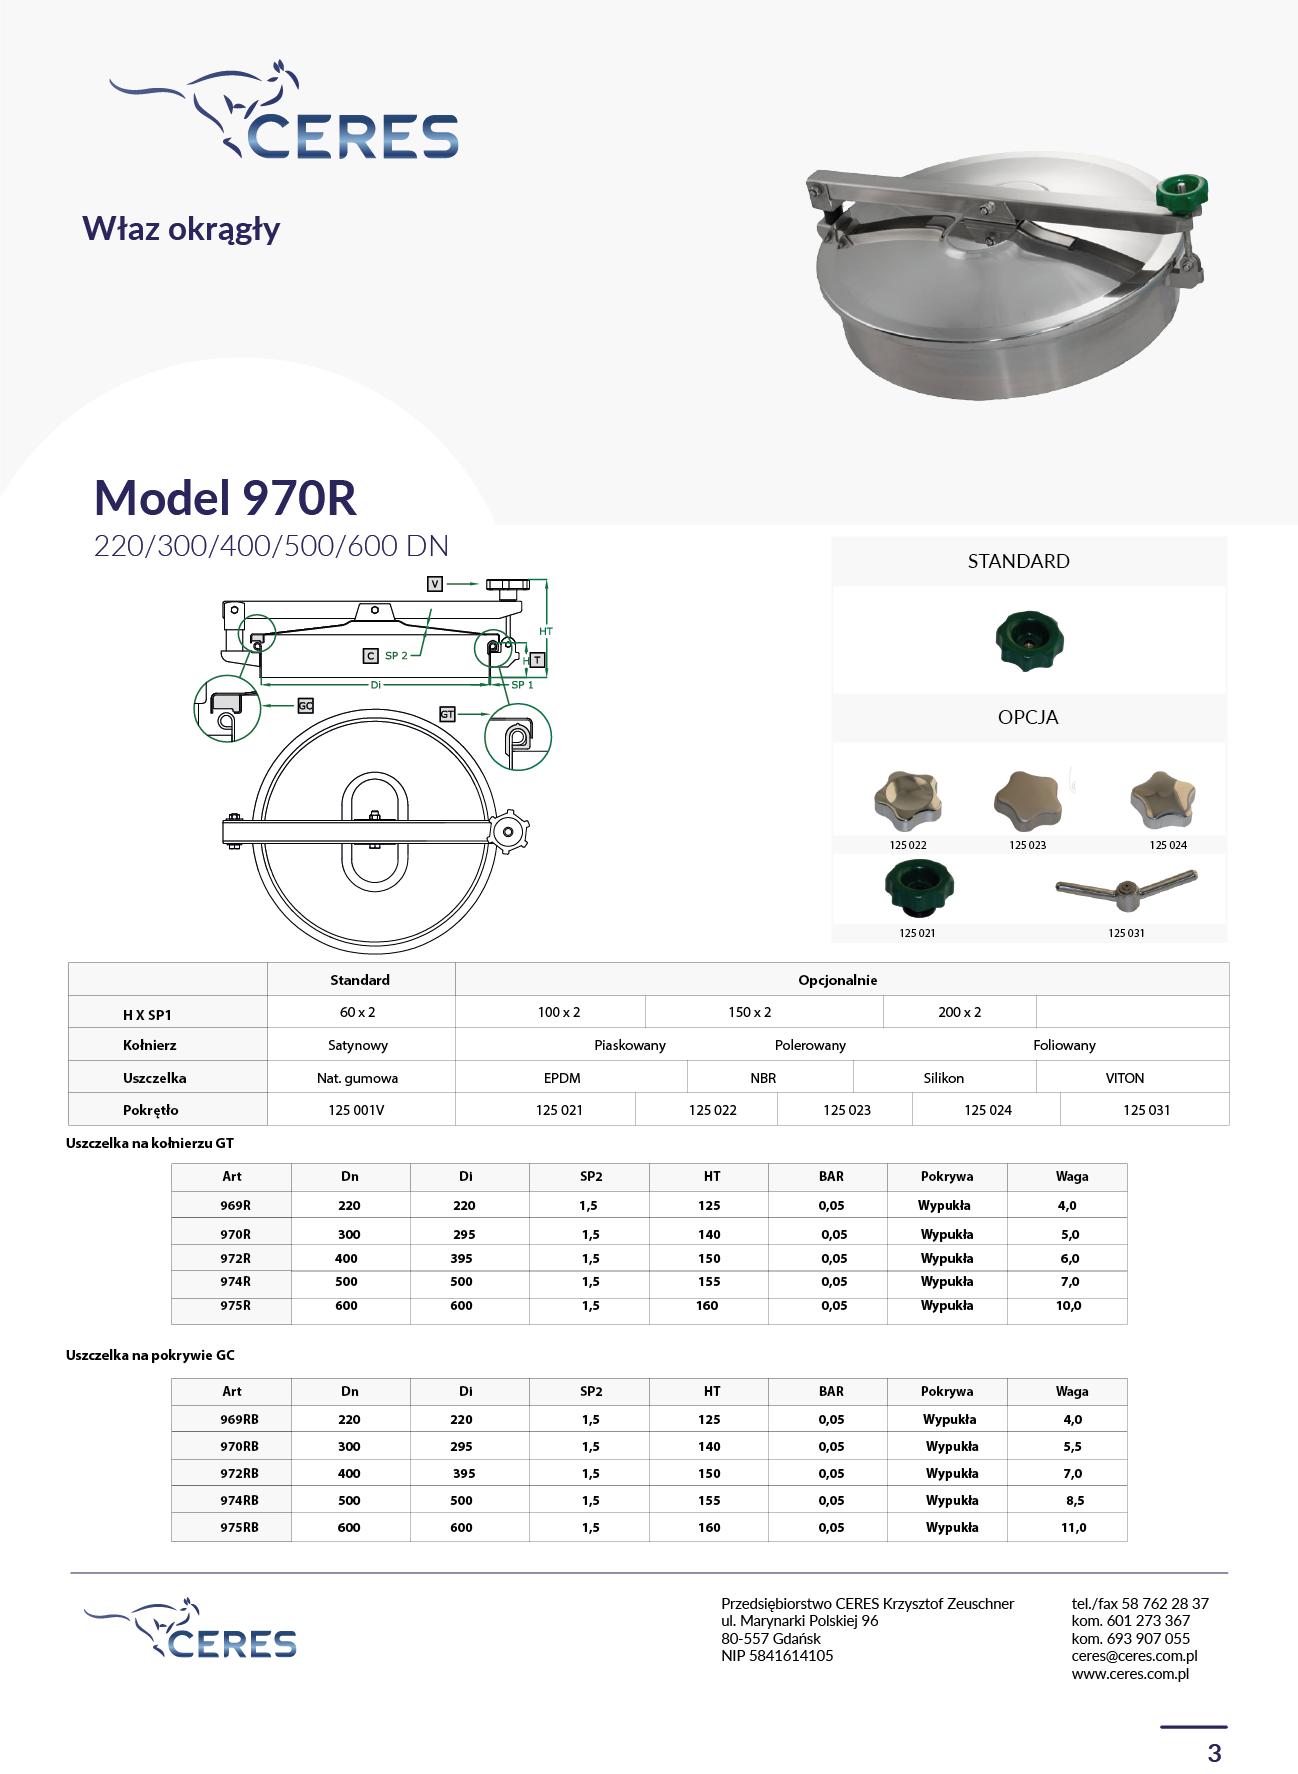 MODEL 970R